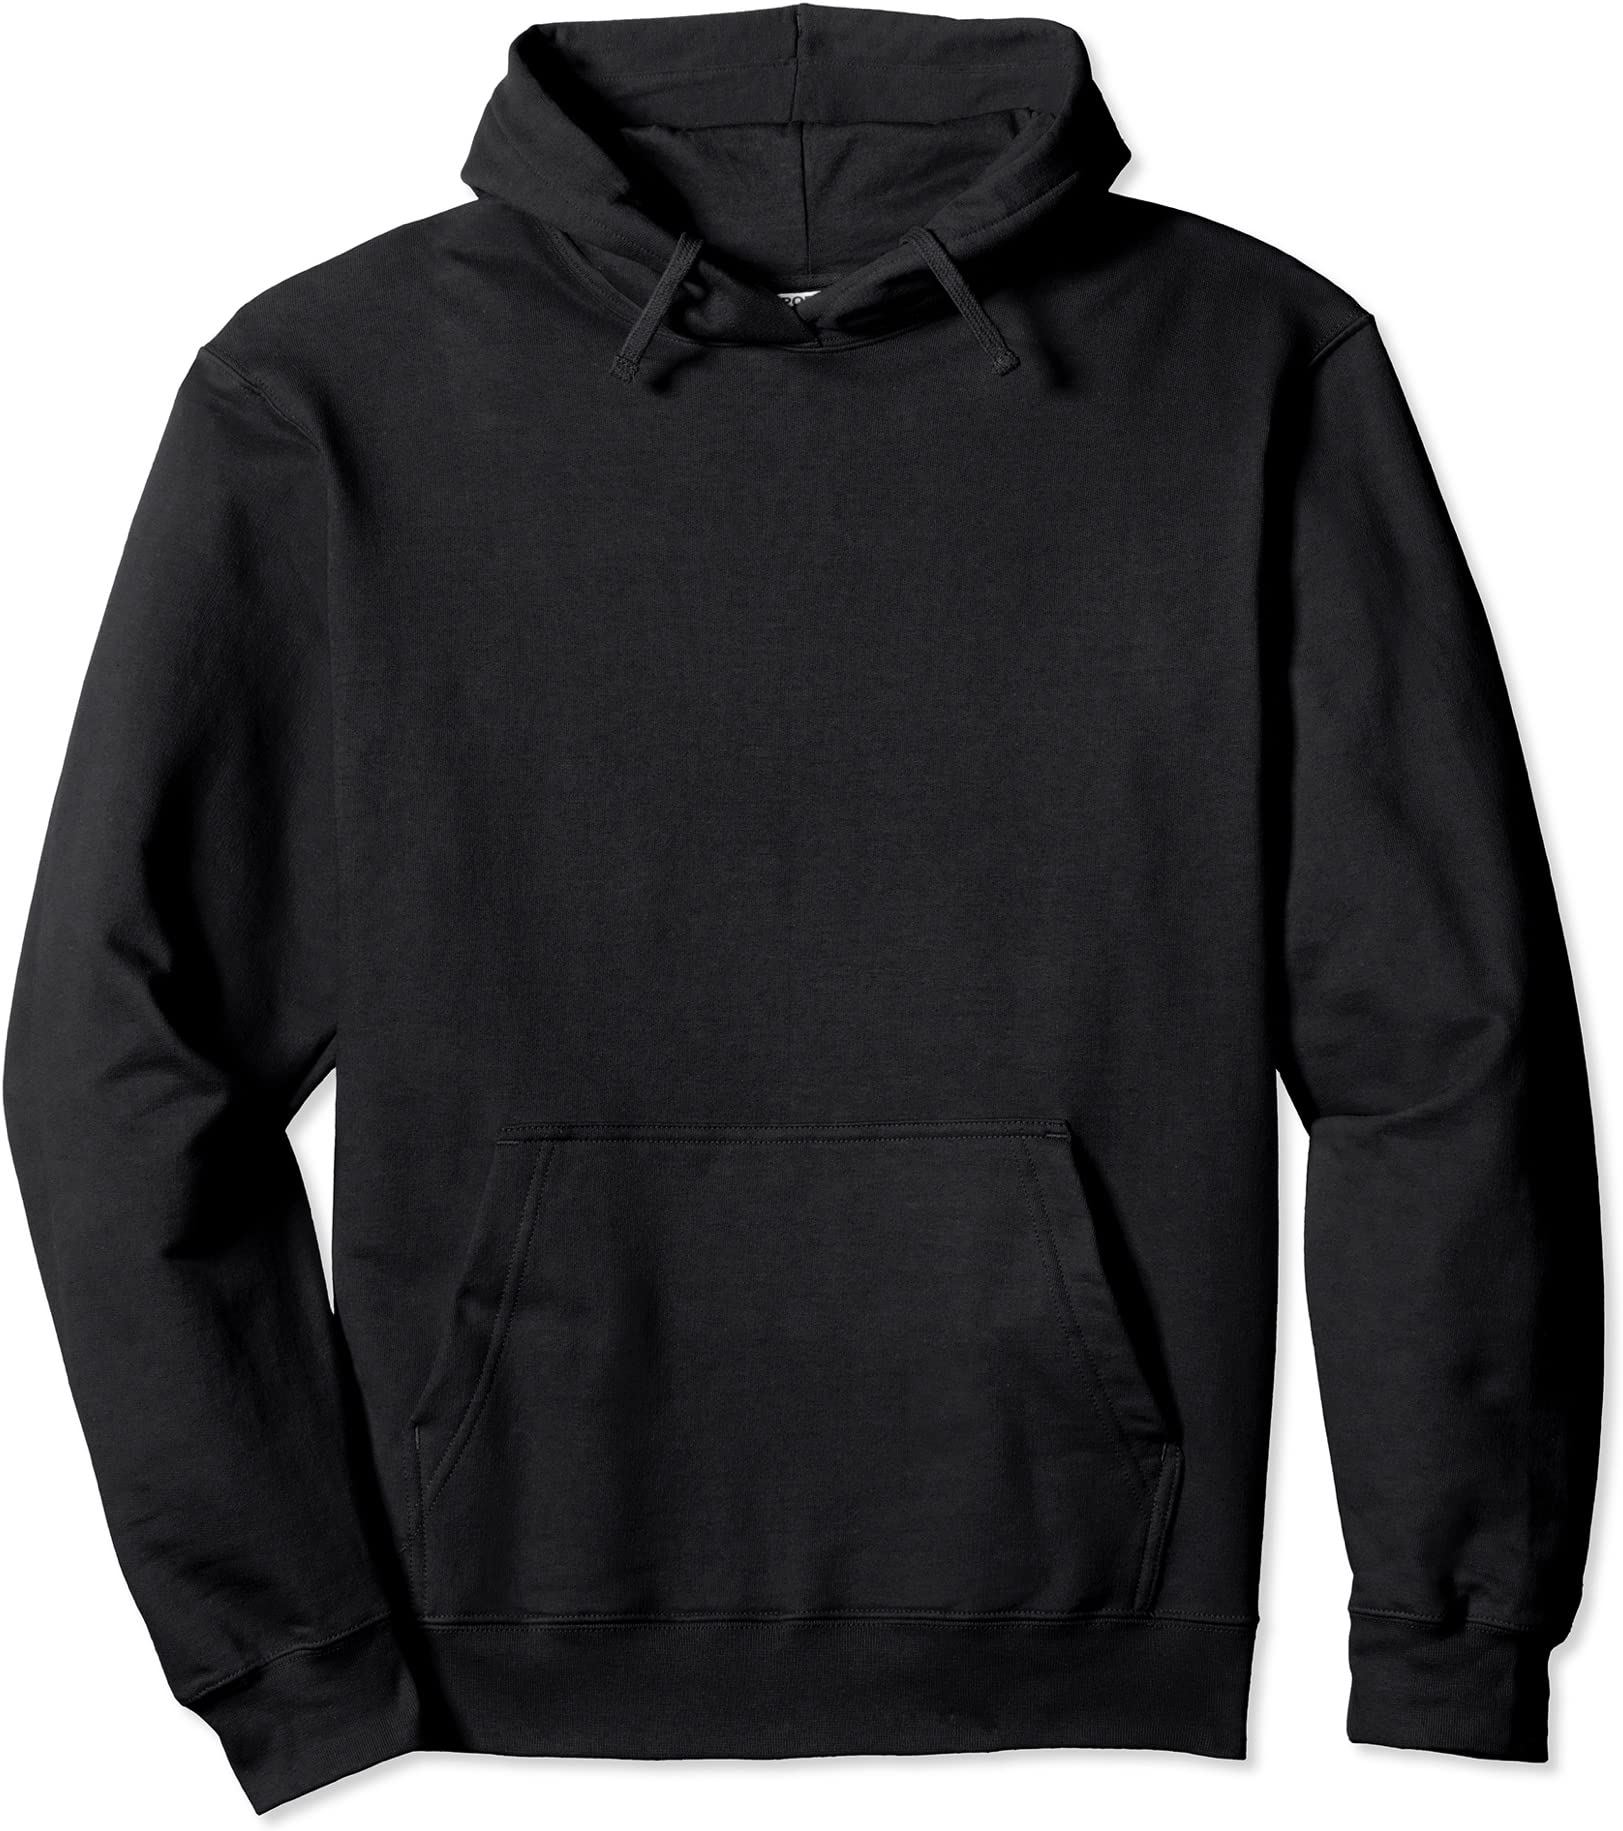 Unisex Black Sweatshirt Eat a Lot Sleep a Lot Graphic Sweatshirts